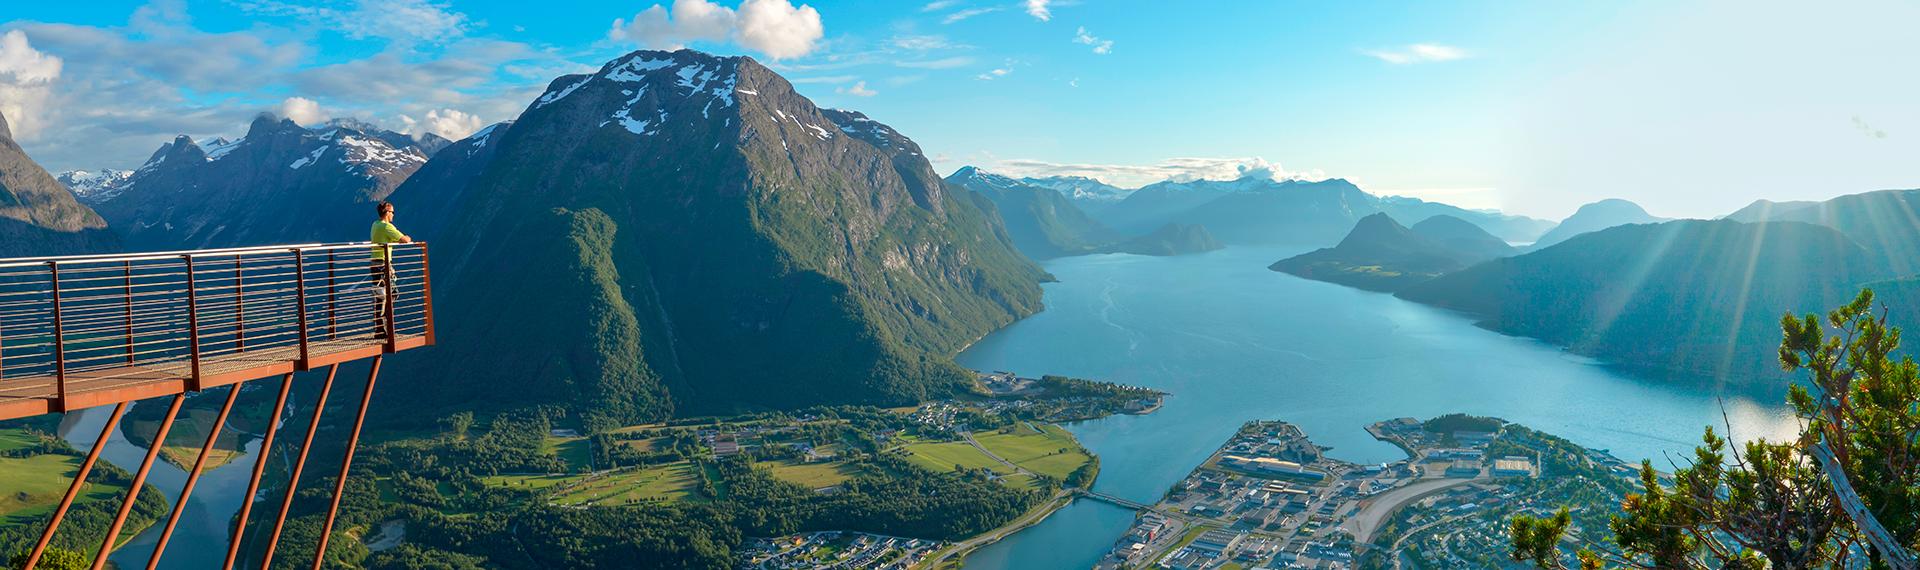 Rampestreken, Åndalsnes, Romsdalen, Norway